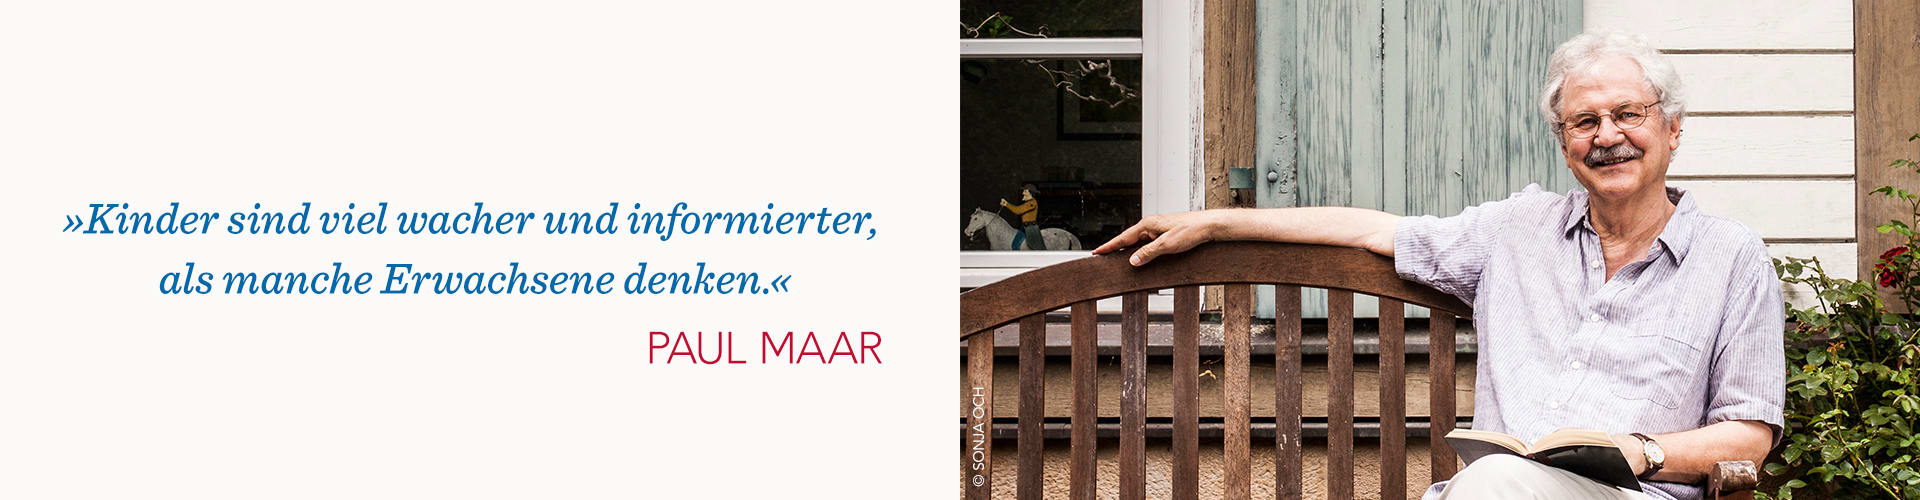 Paul Maar Portrait und Zitat